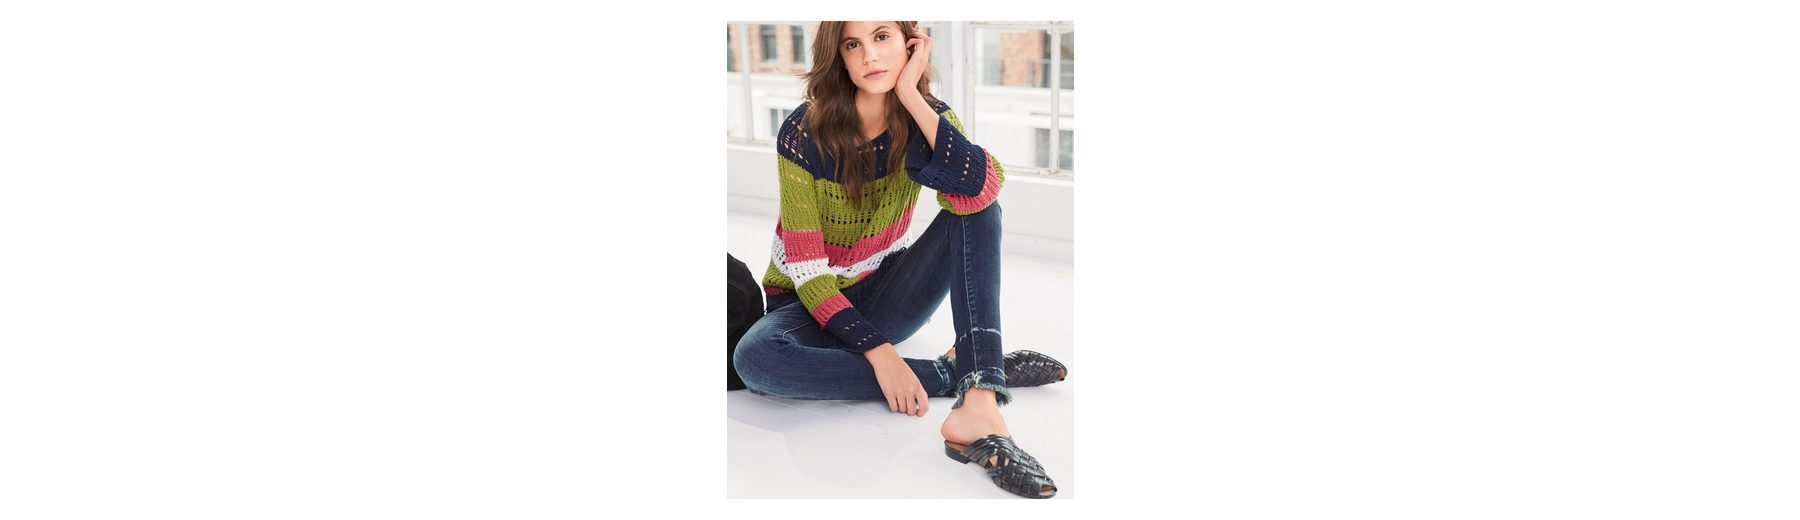 Next Skinny-Jeans mit unversäubertem Saum Rabatt Exklusiv vjsyu